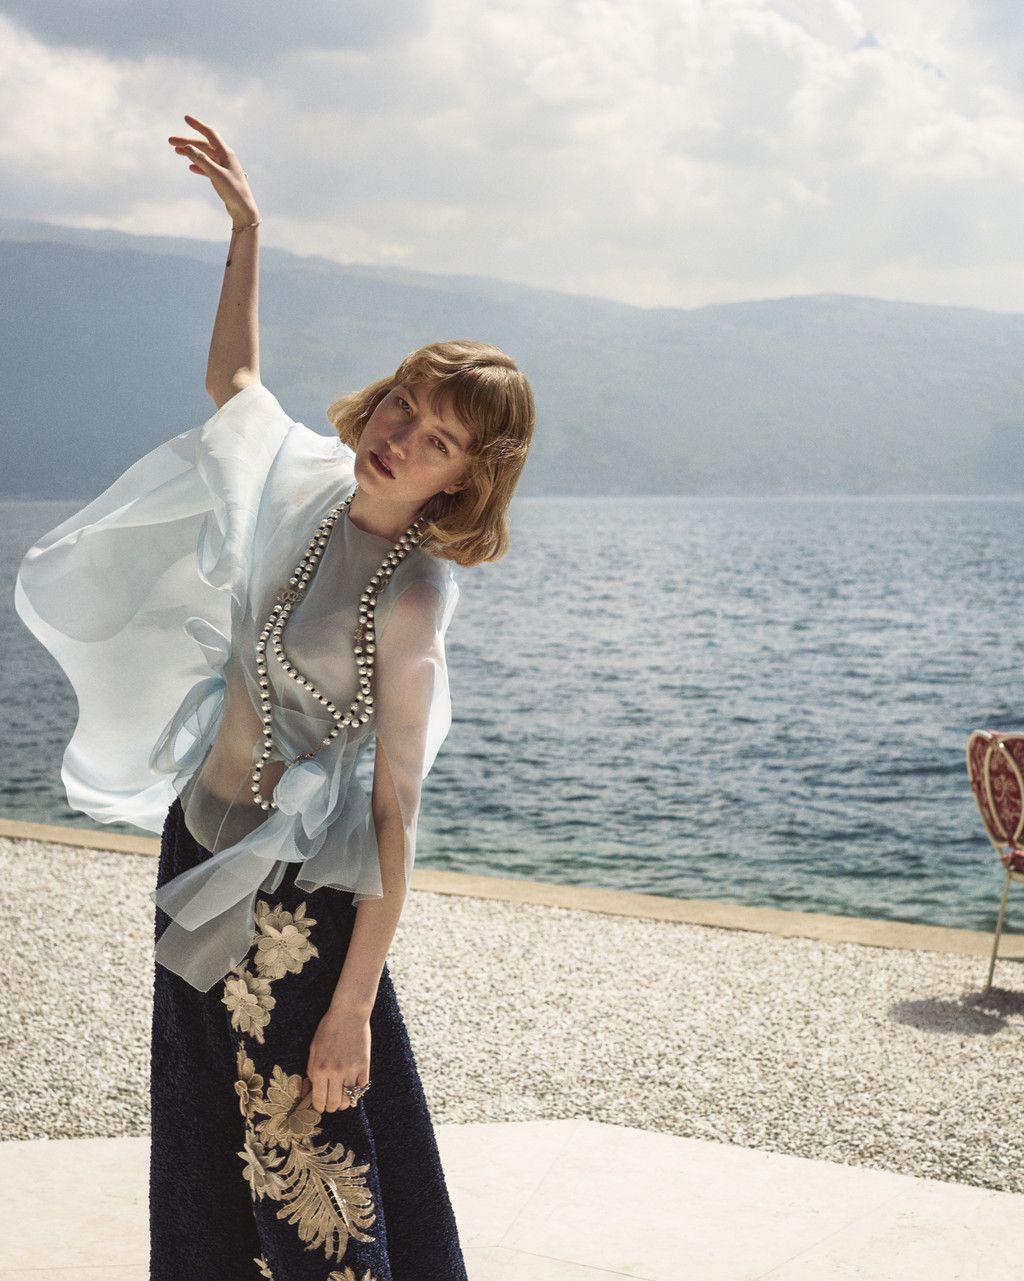 Elizaveta Porodina | Lazy Days of Summer | fashion and fine art photography